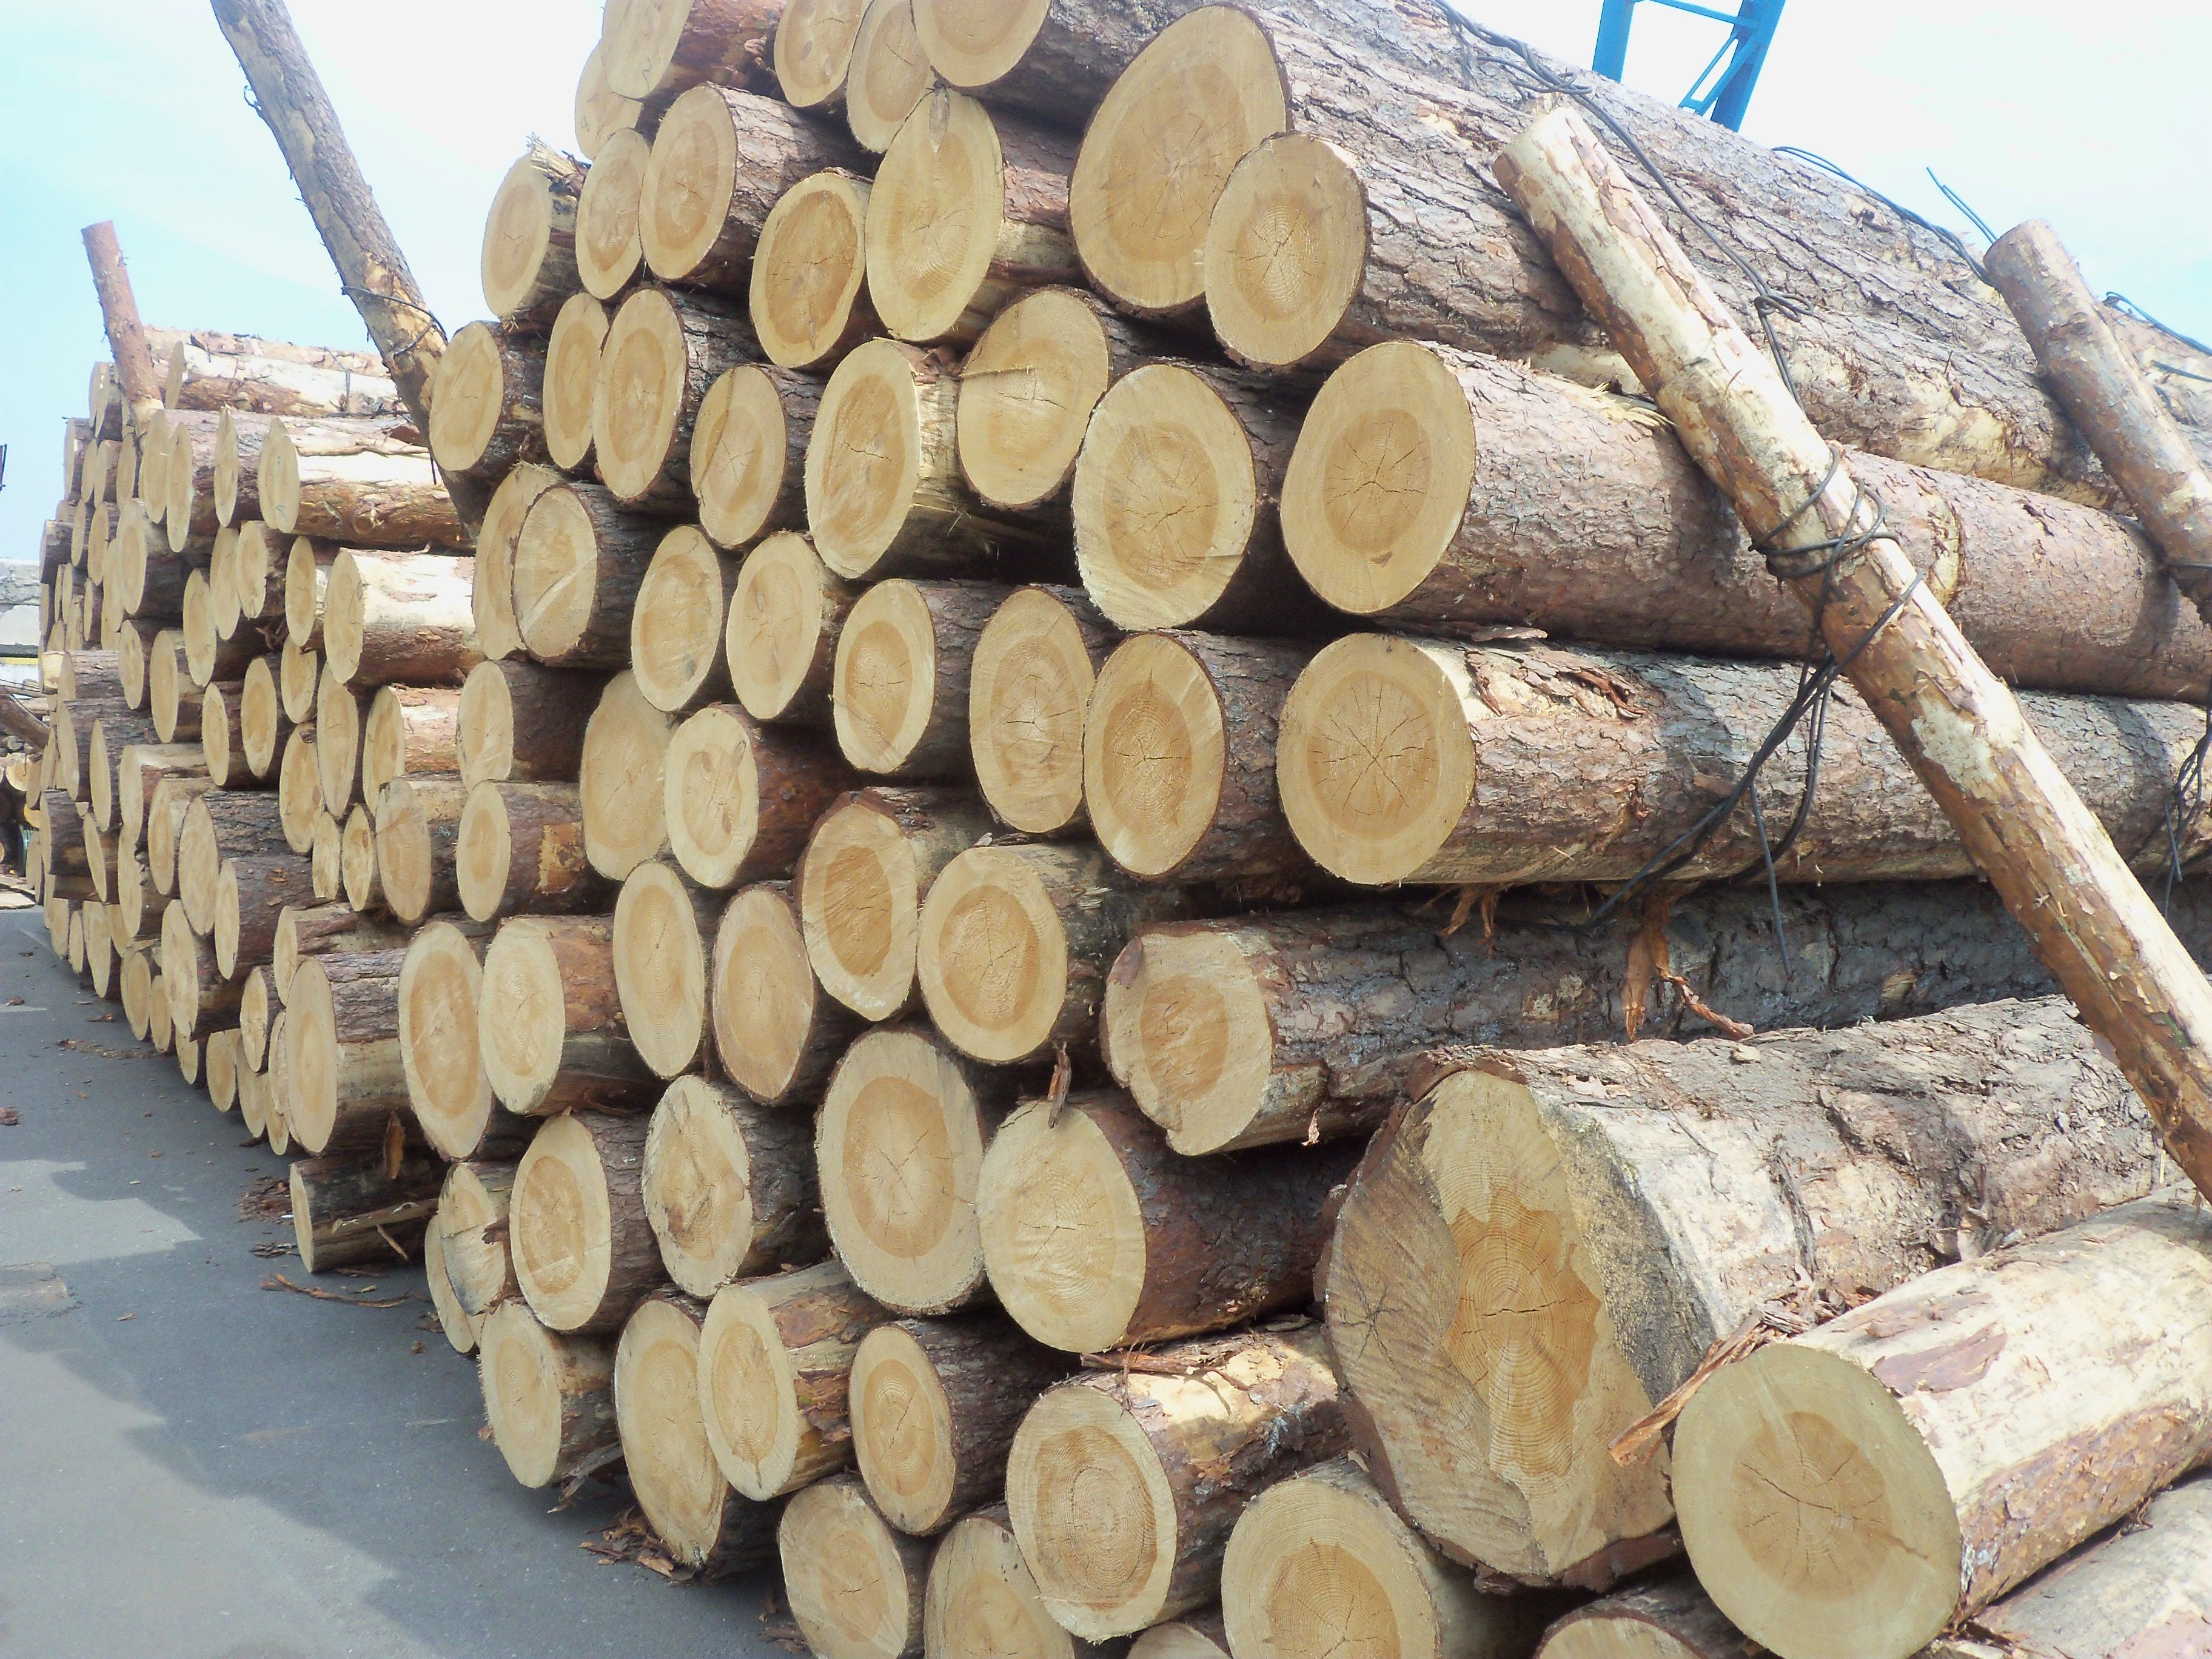 Pine wood logs, bark-on, fresh cut